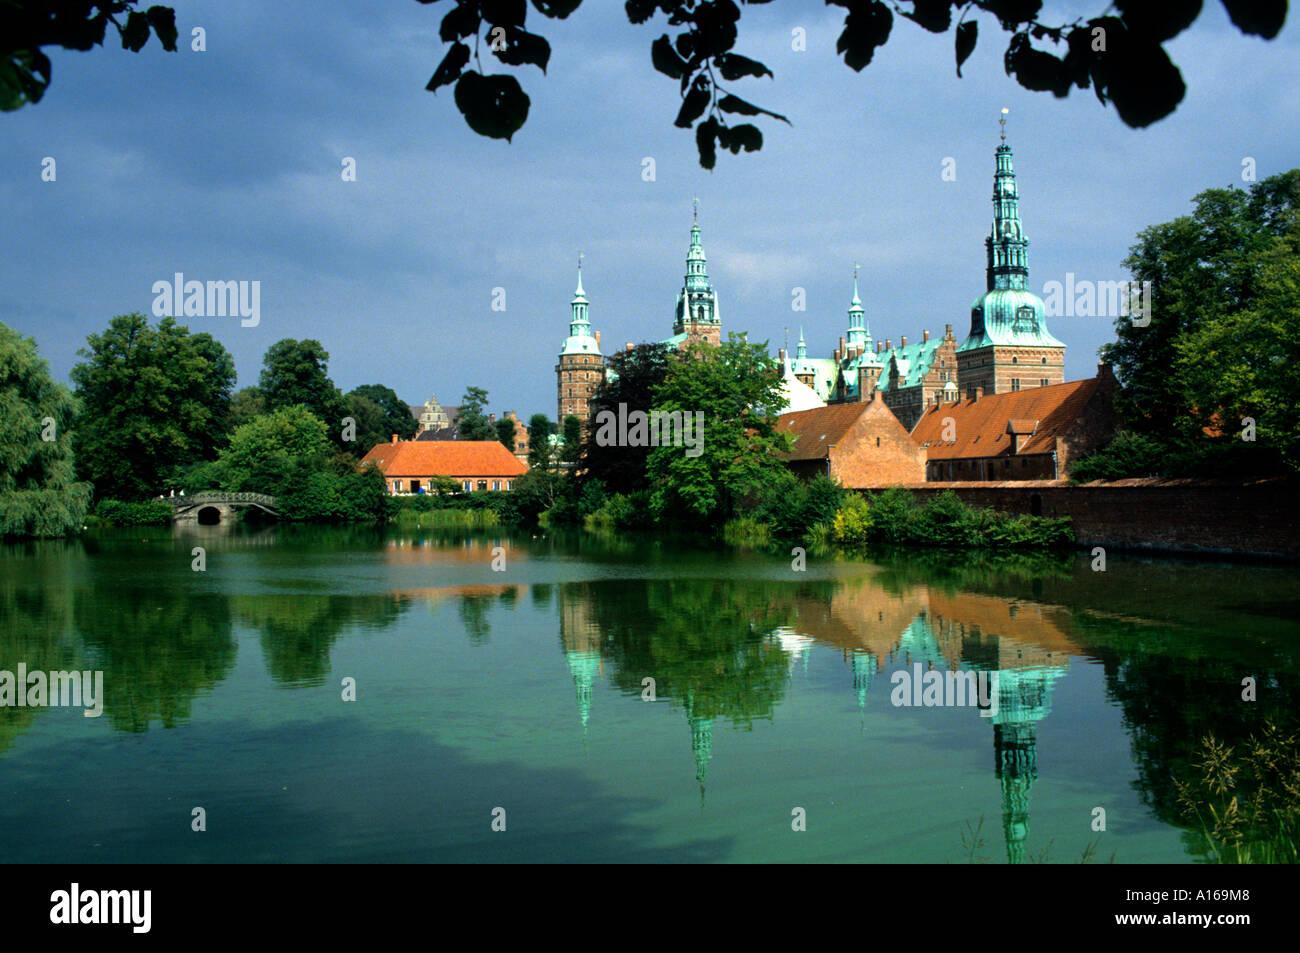 Denmark Hillerod Frederiksborg Castle palace Royal  King Frederick II - Stock Image